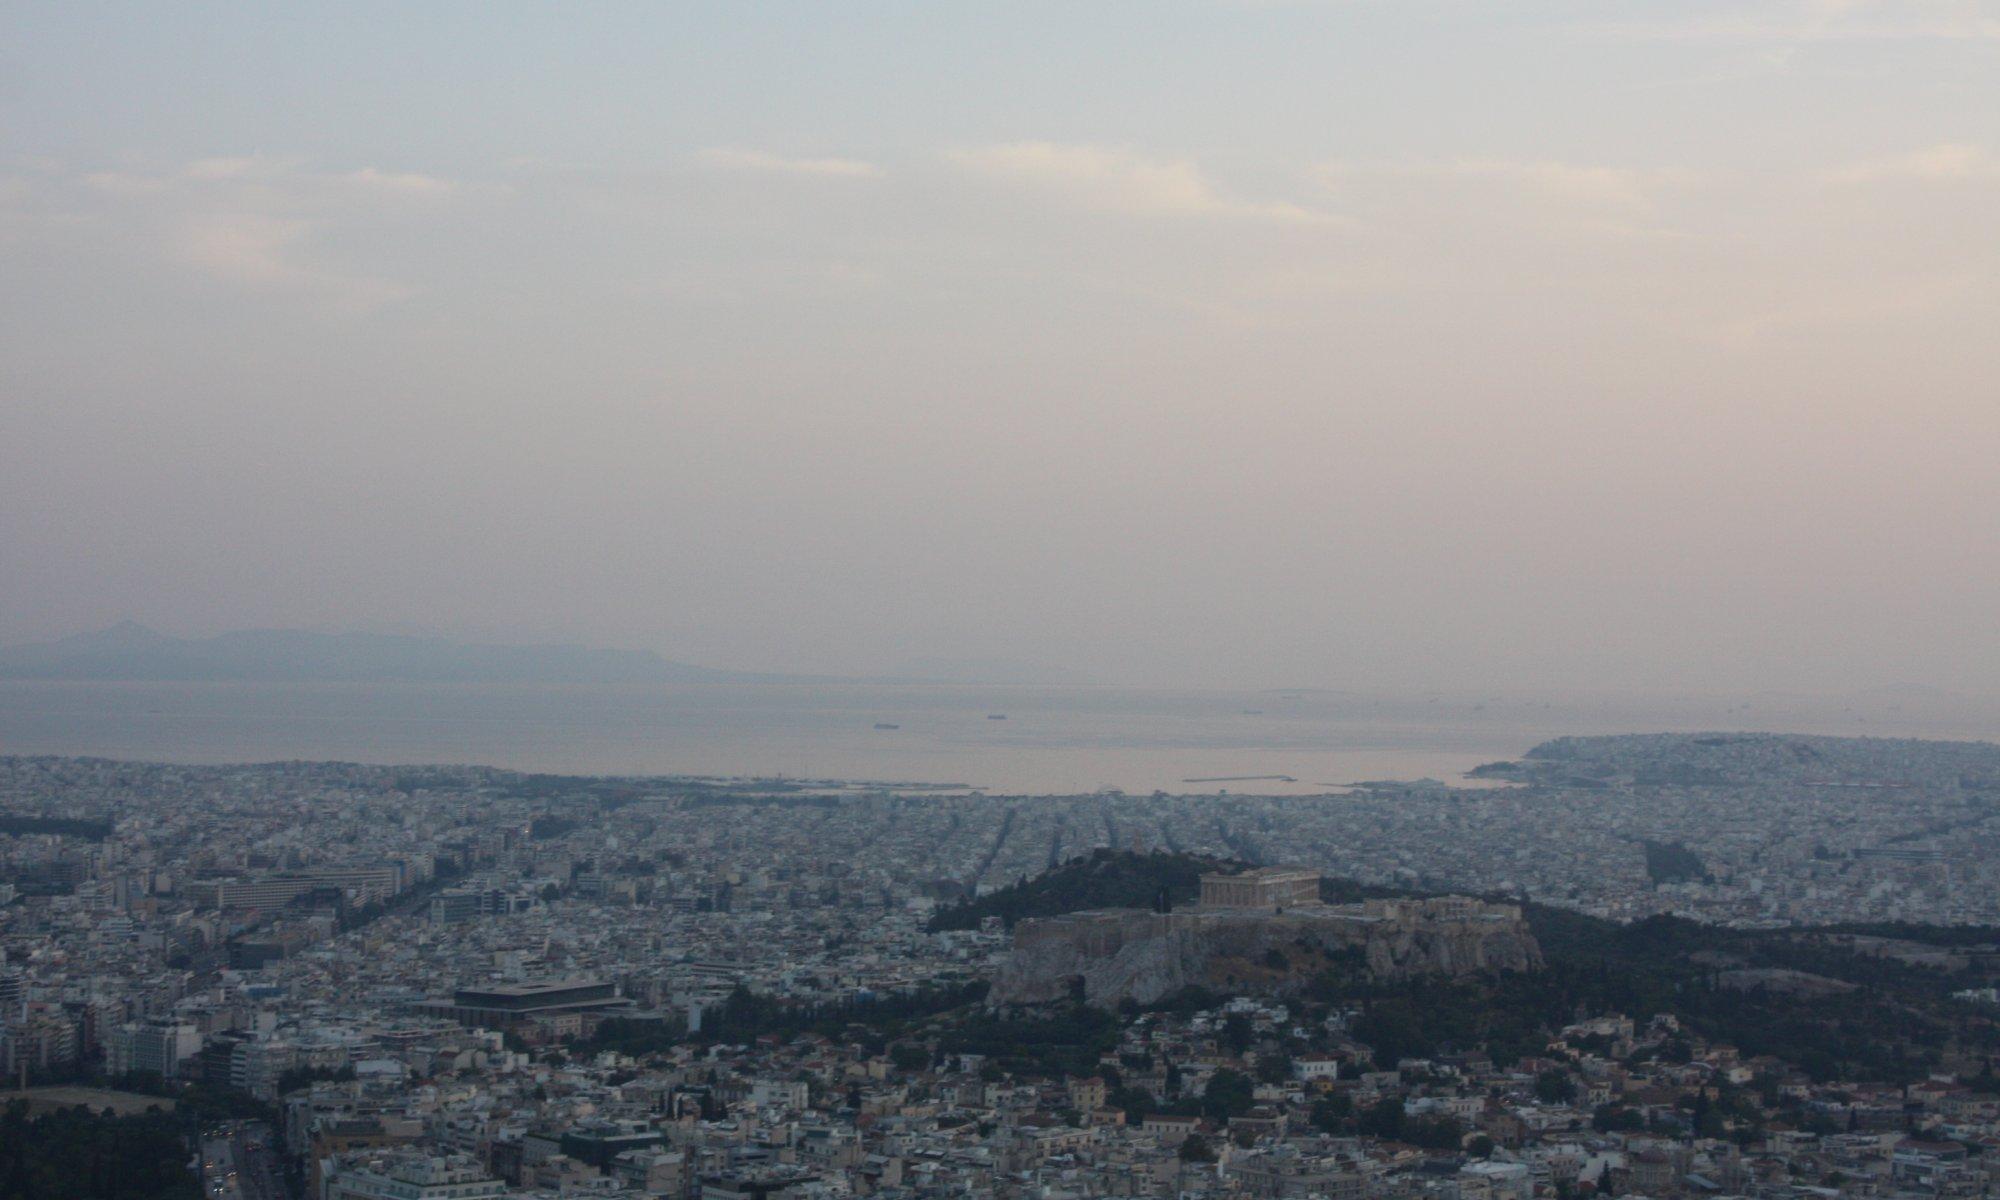 Lykavittós, Αθήνα, Greece